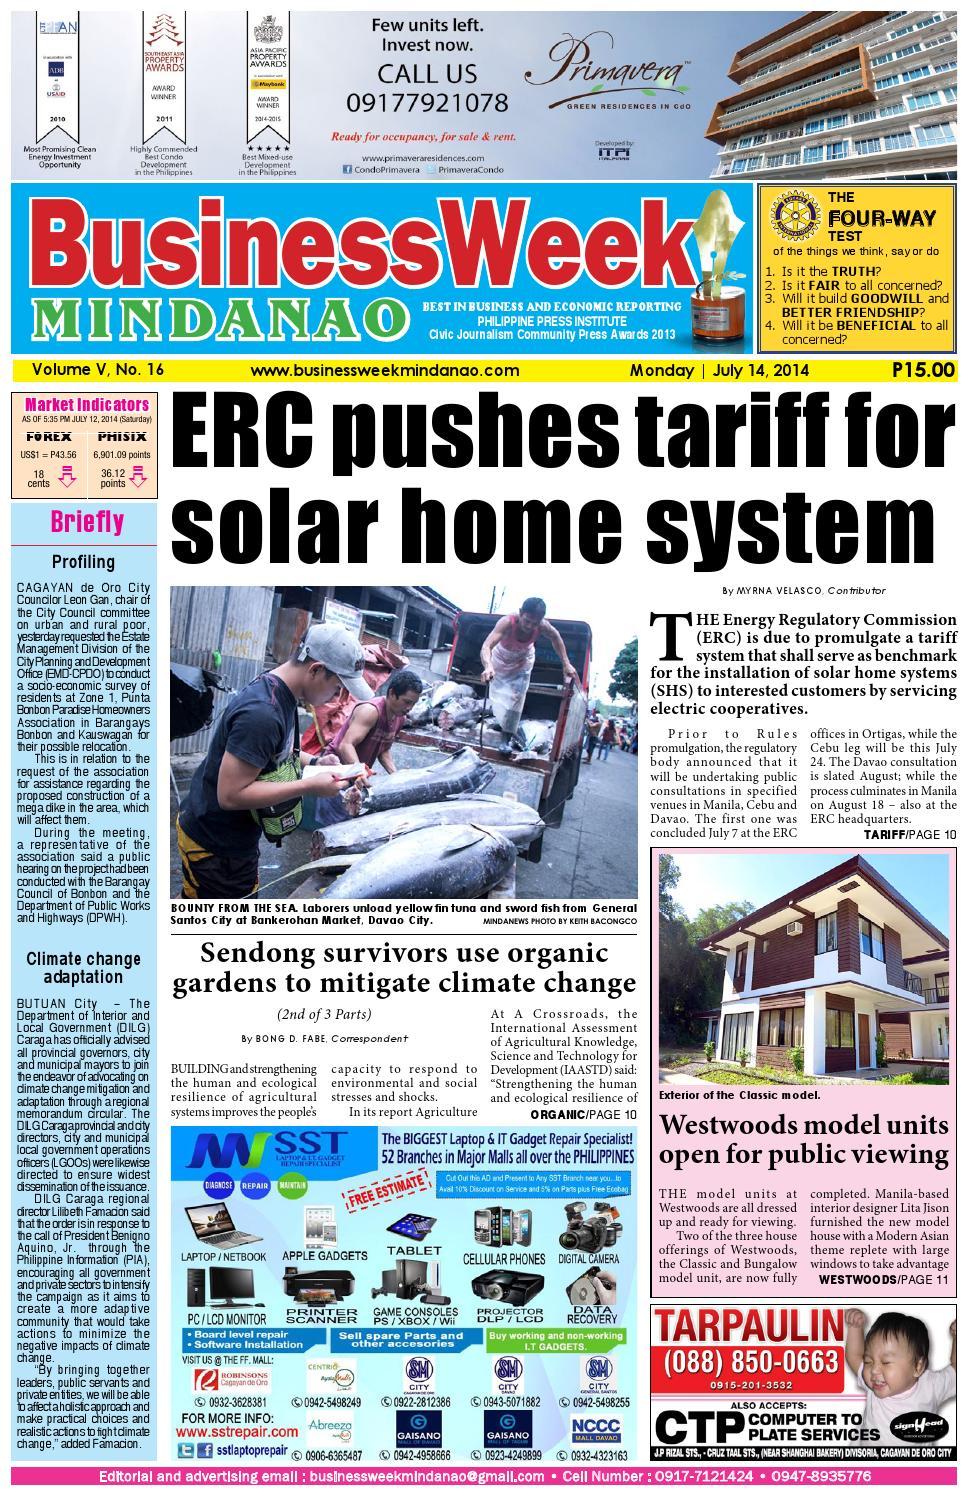 BusinessWeek Mindanao (July 14, 2014) by Mindanao Daily News